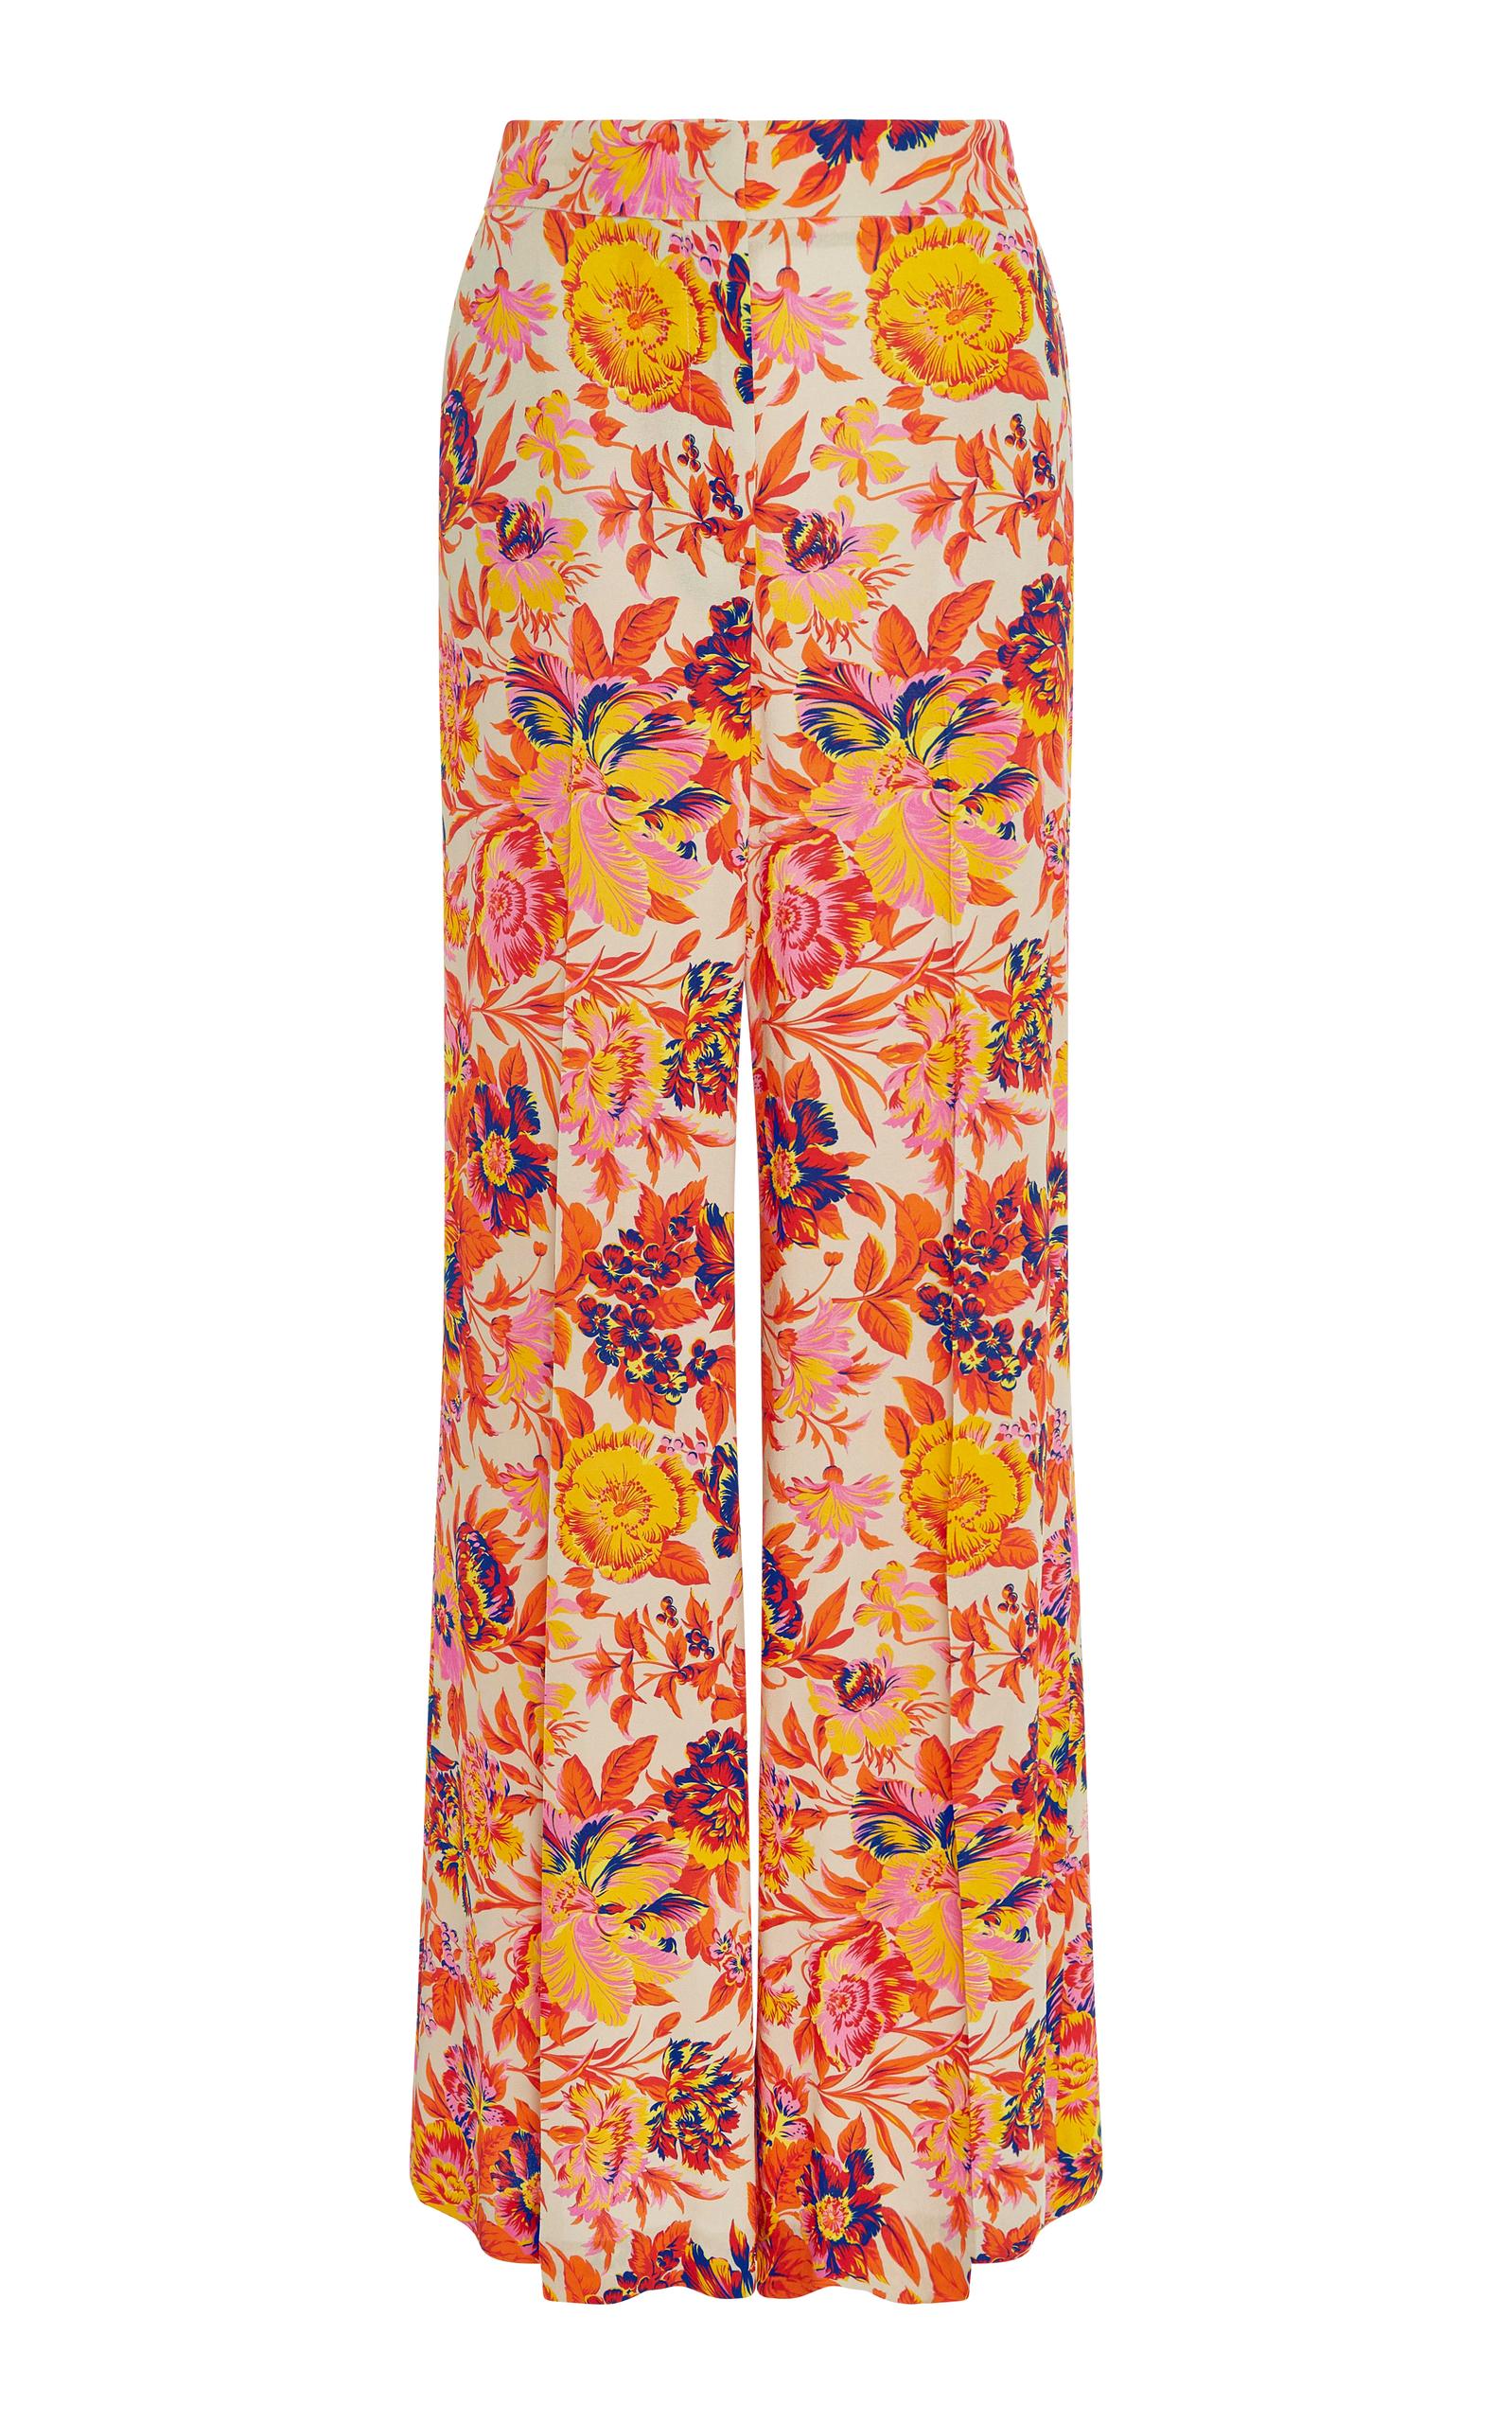 Jungle Floral Impression Pantalon Jambe Droite Msgm o90GpQ